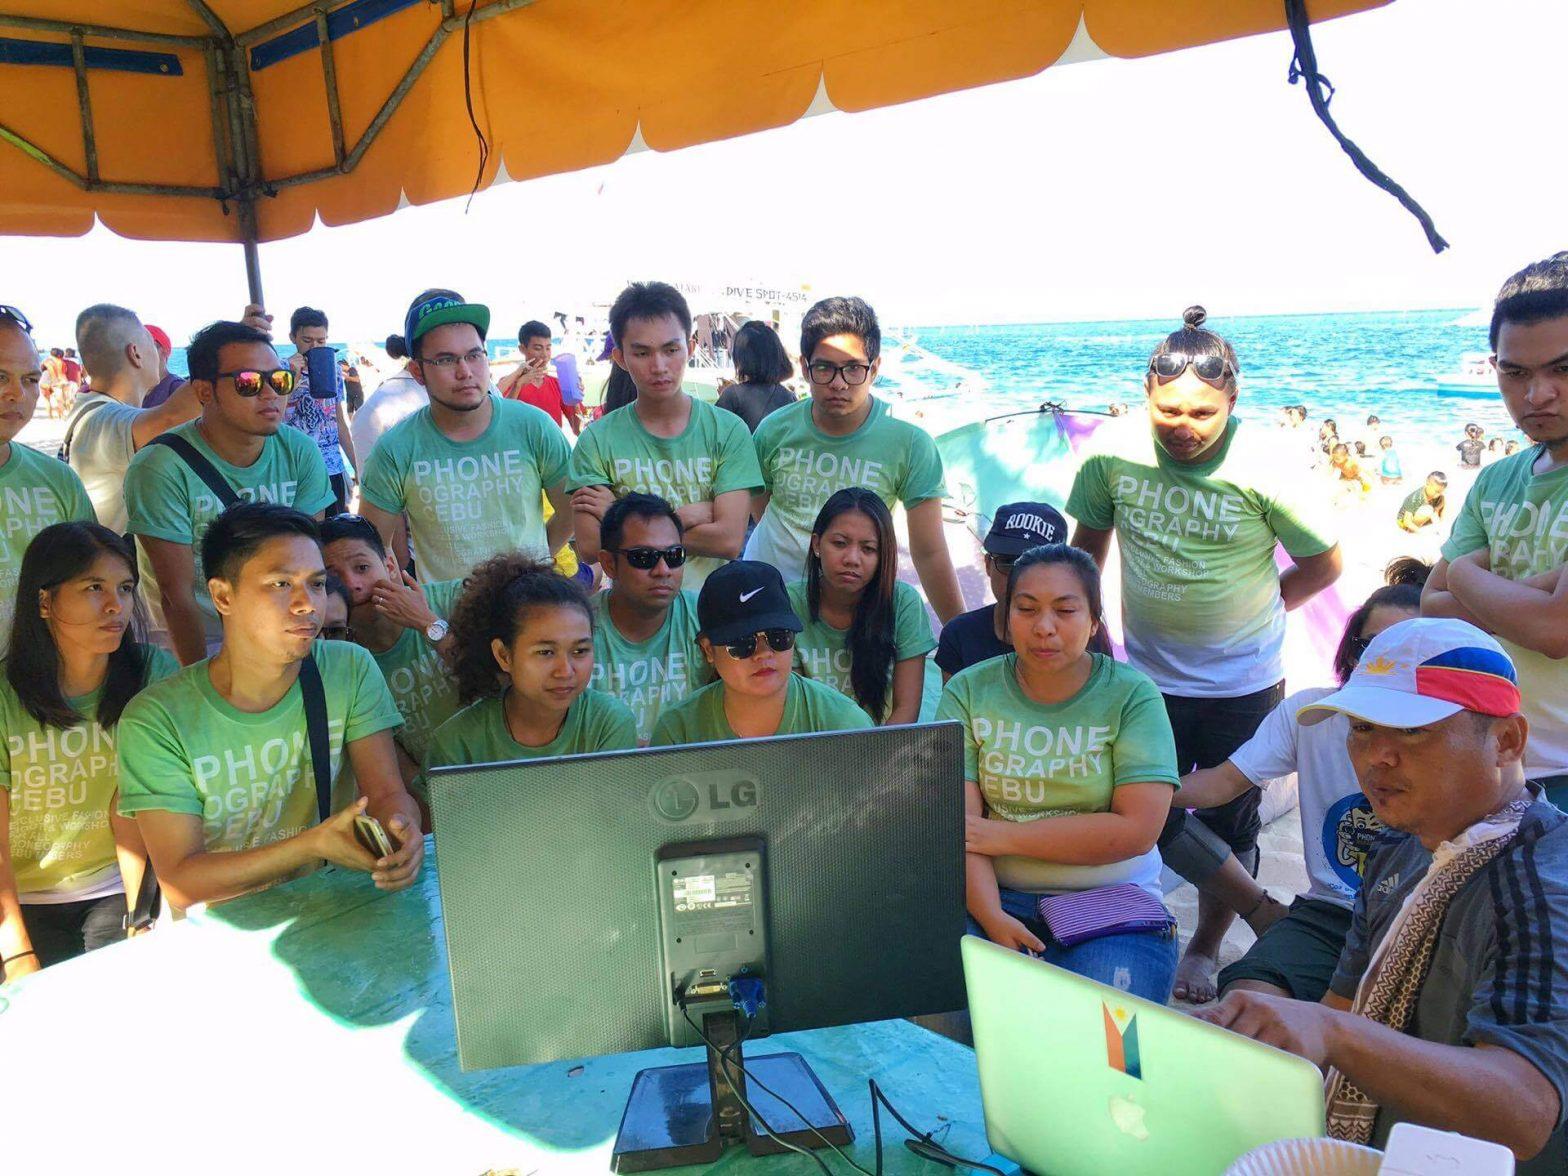 Phoneography Cebu